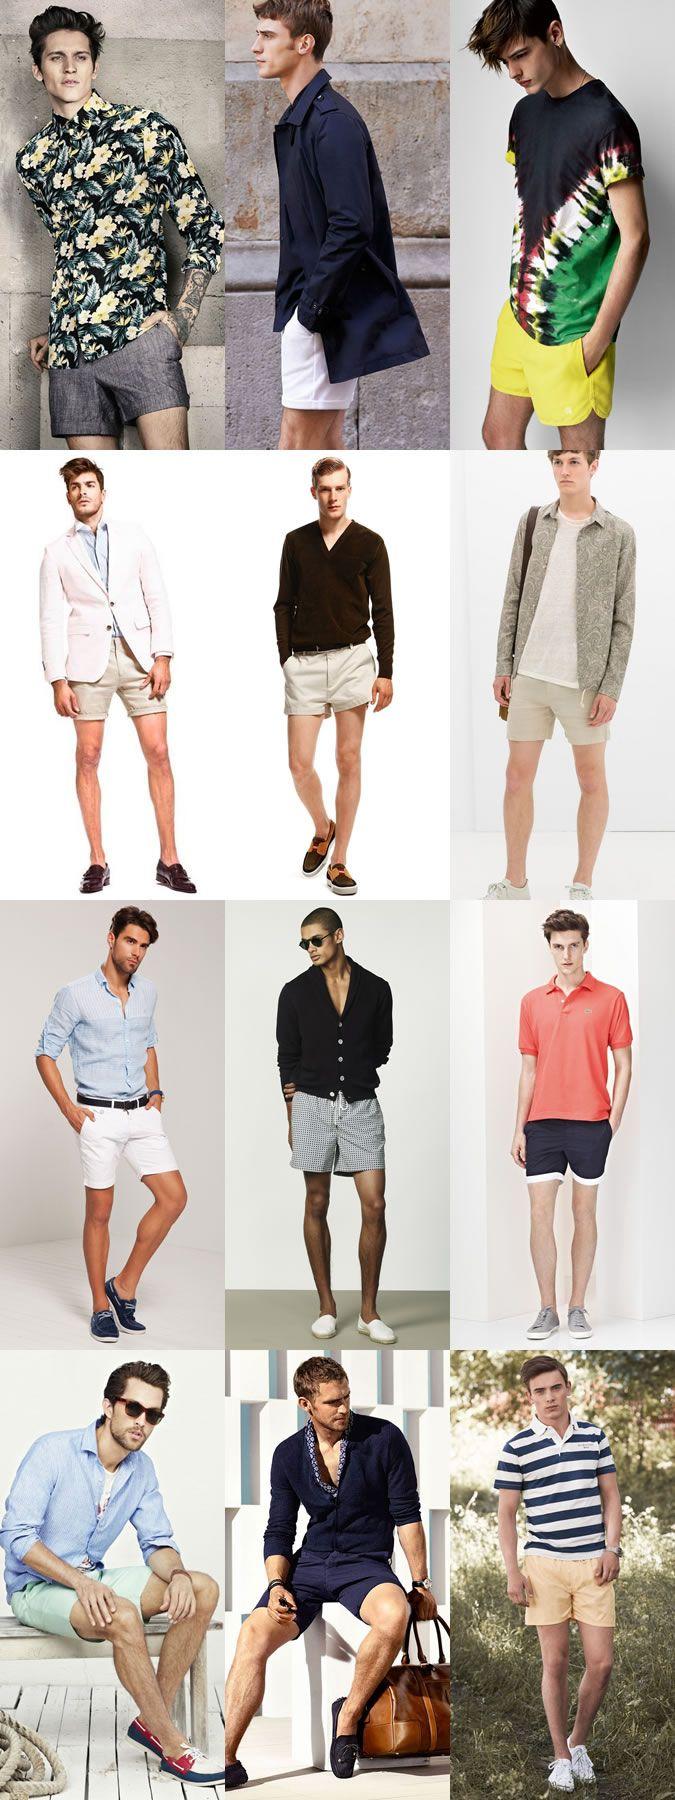 Celebrity Fashion Lookbook - Clothing (Brand) - Maroubra ...